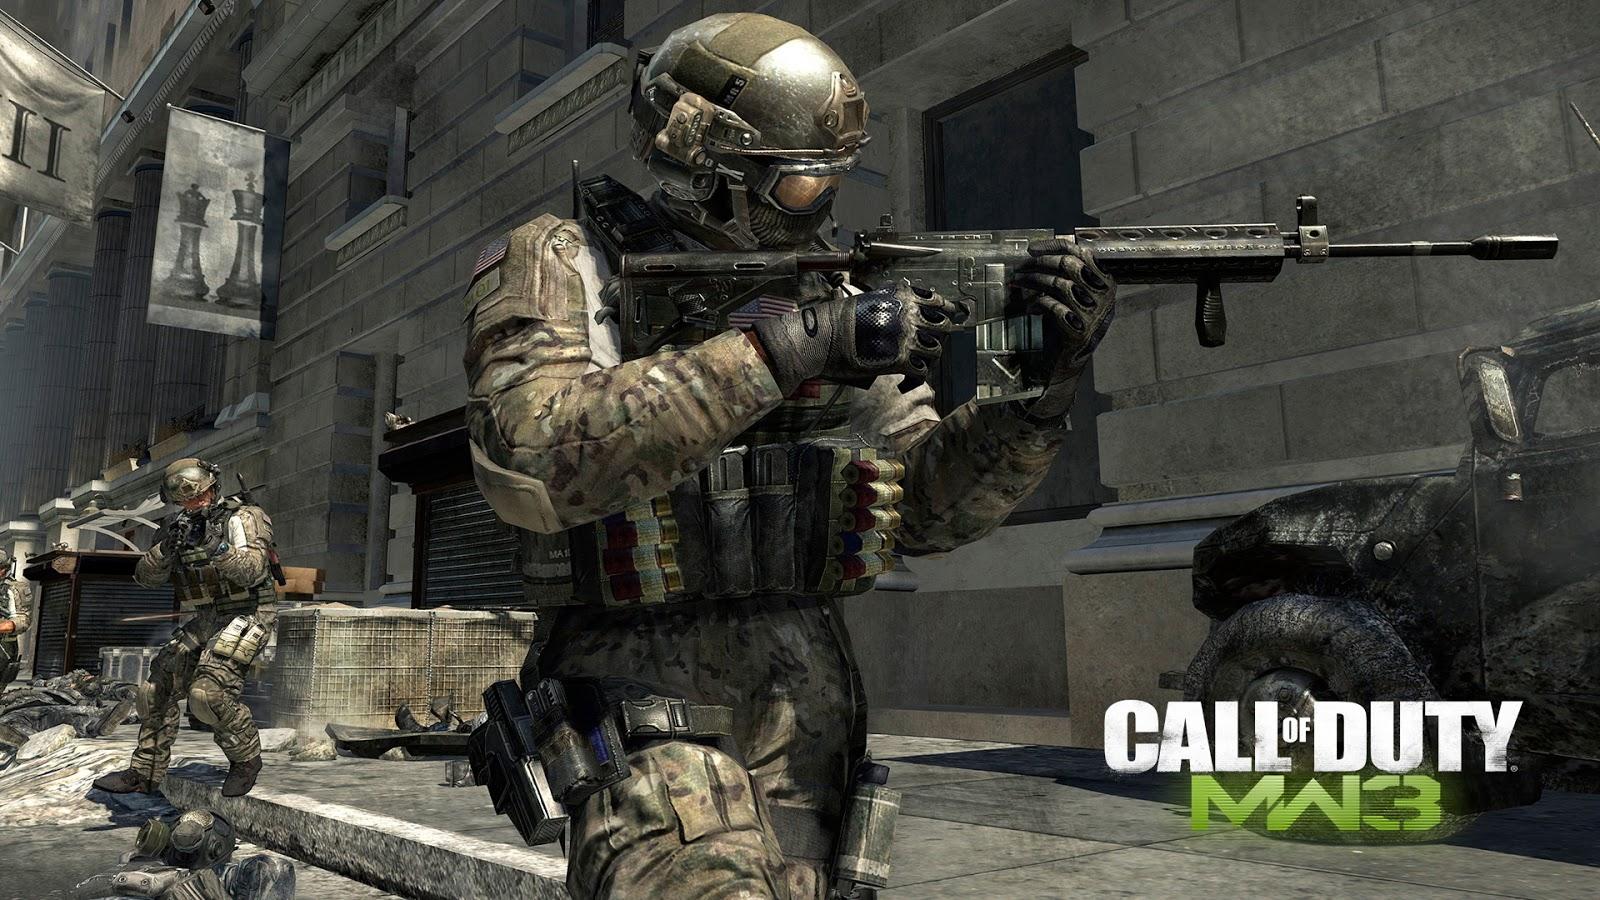 HD WALLPAPERS Call Of Duty Modern Warfare 3 Wallpapers